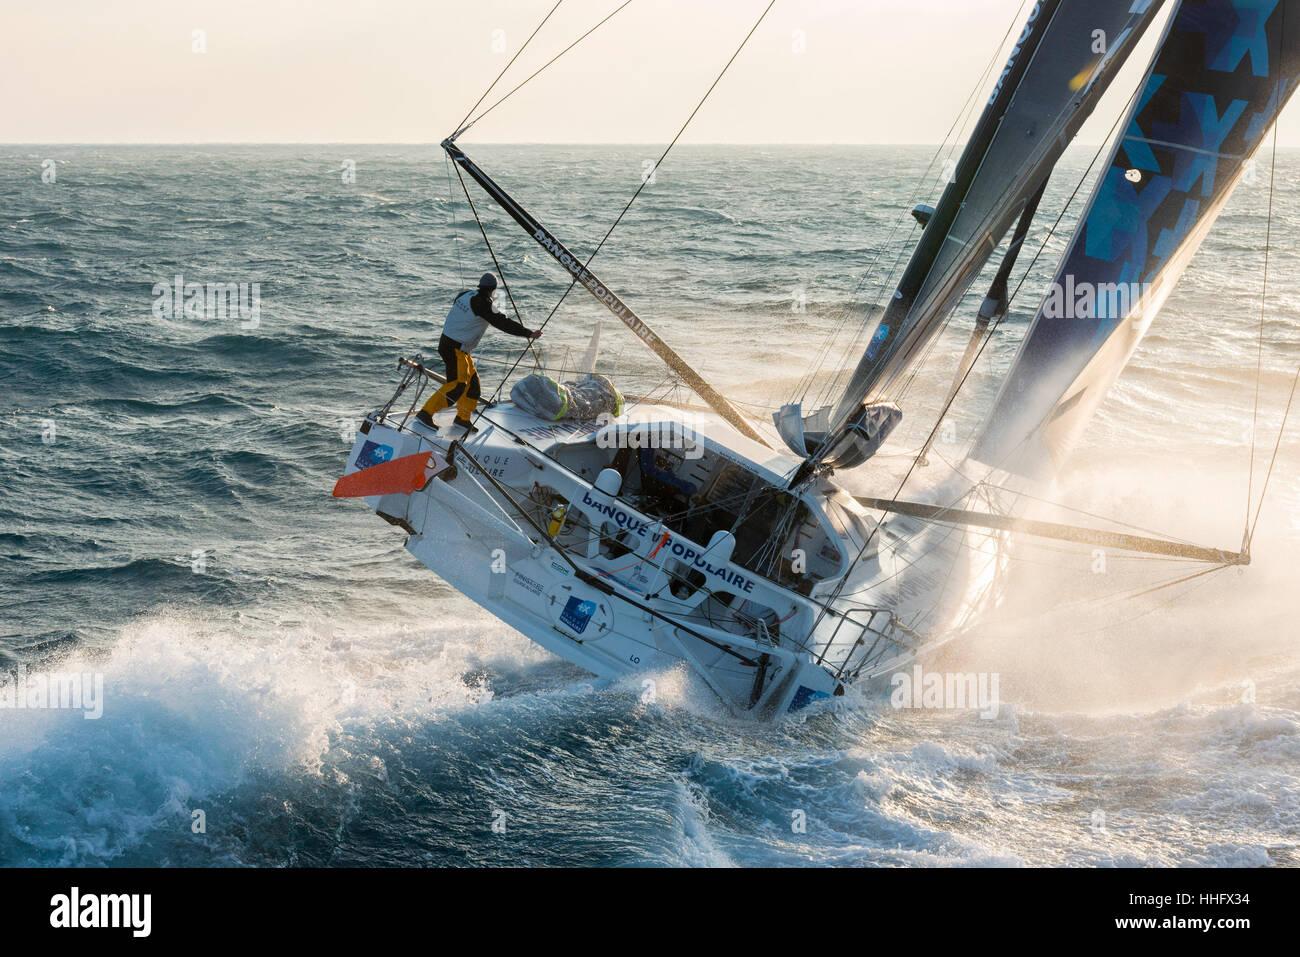 Yacht race Vendée Globe 2017: Armel Le Cléac'h aboard the Banque Populaire VIII monohull sailing (2017/01/19) Stock Photo